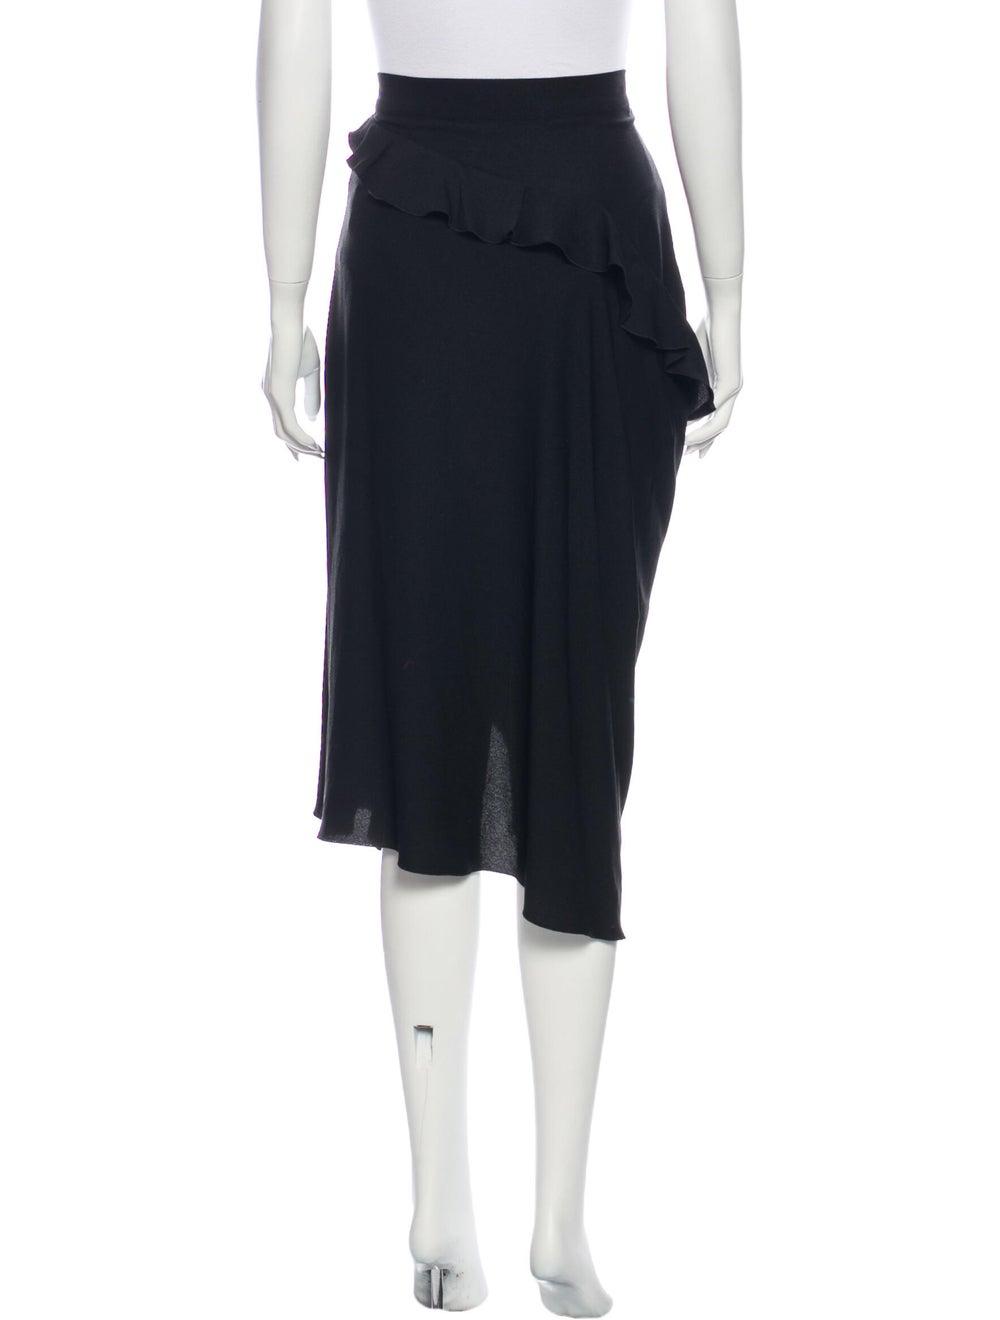 Altuzarra Midi Length Skirt Black - image 3